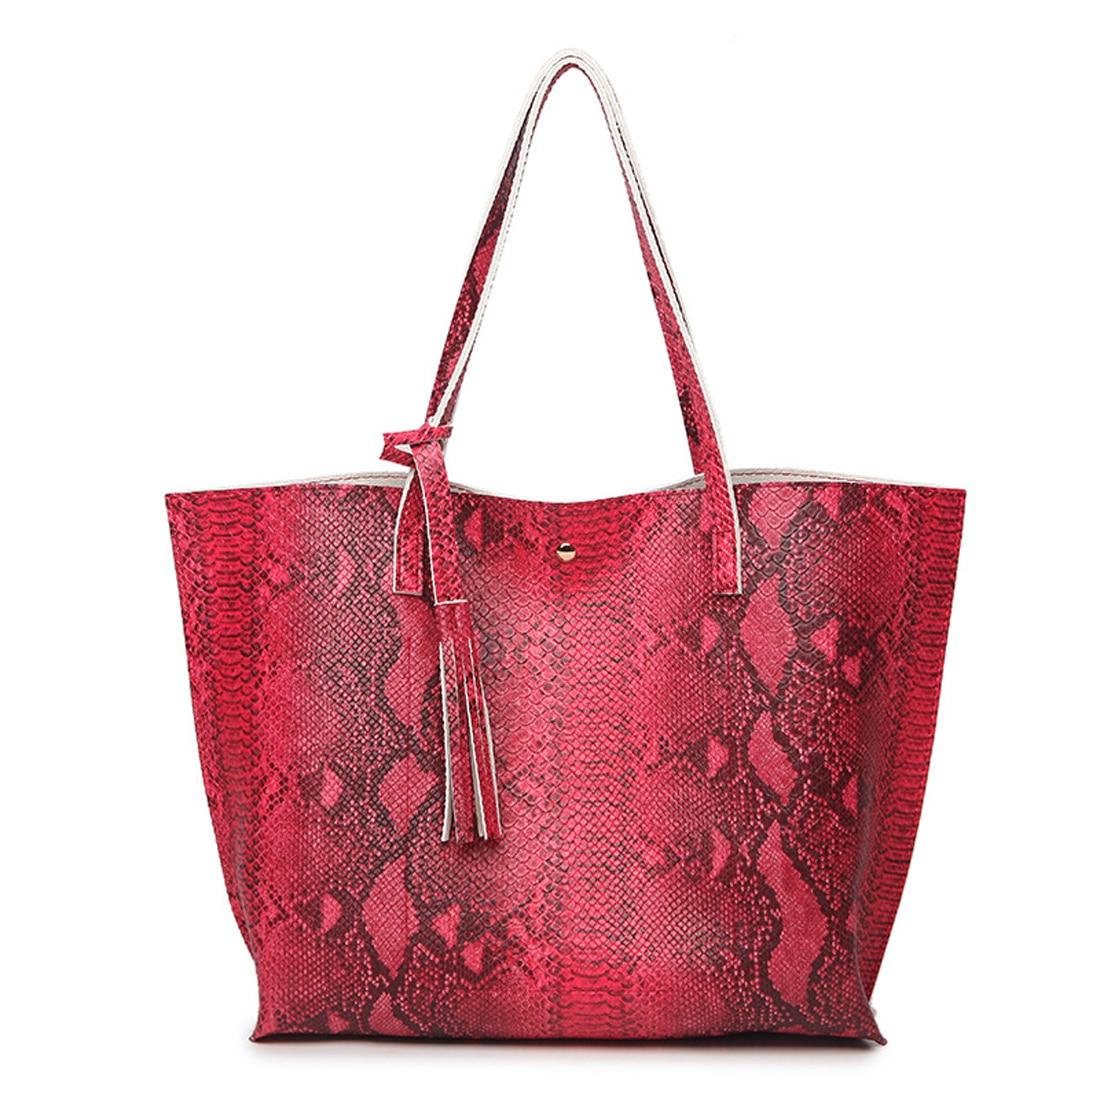 Fashion serpentine women leather handbags Luxury designer female tote bags snake bolsas mjure tassel ladies large shoulder bags